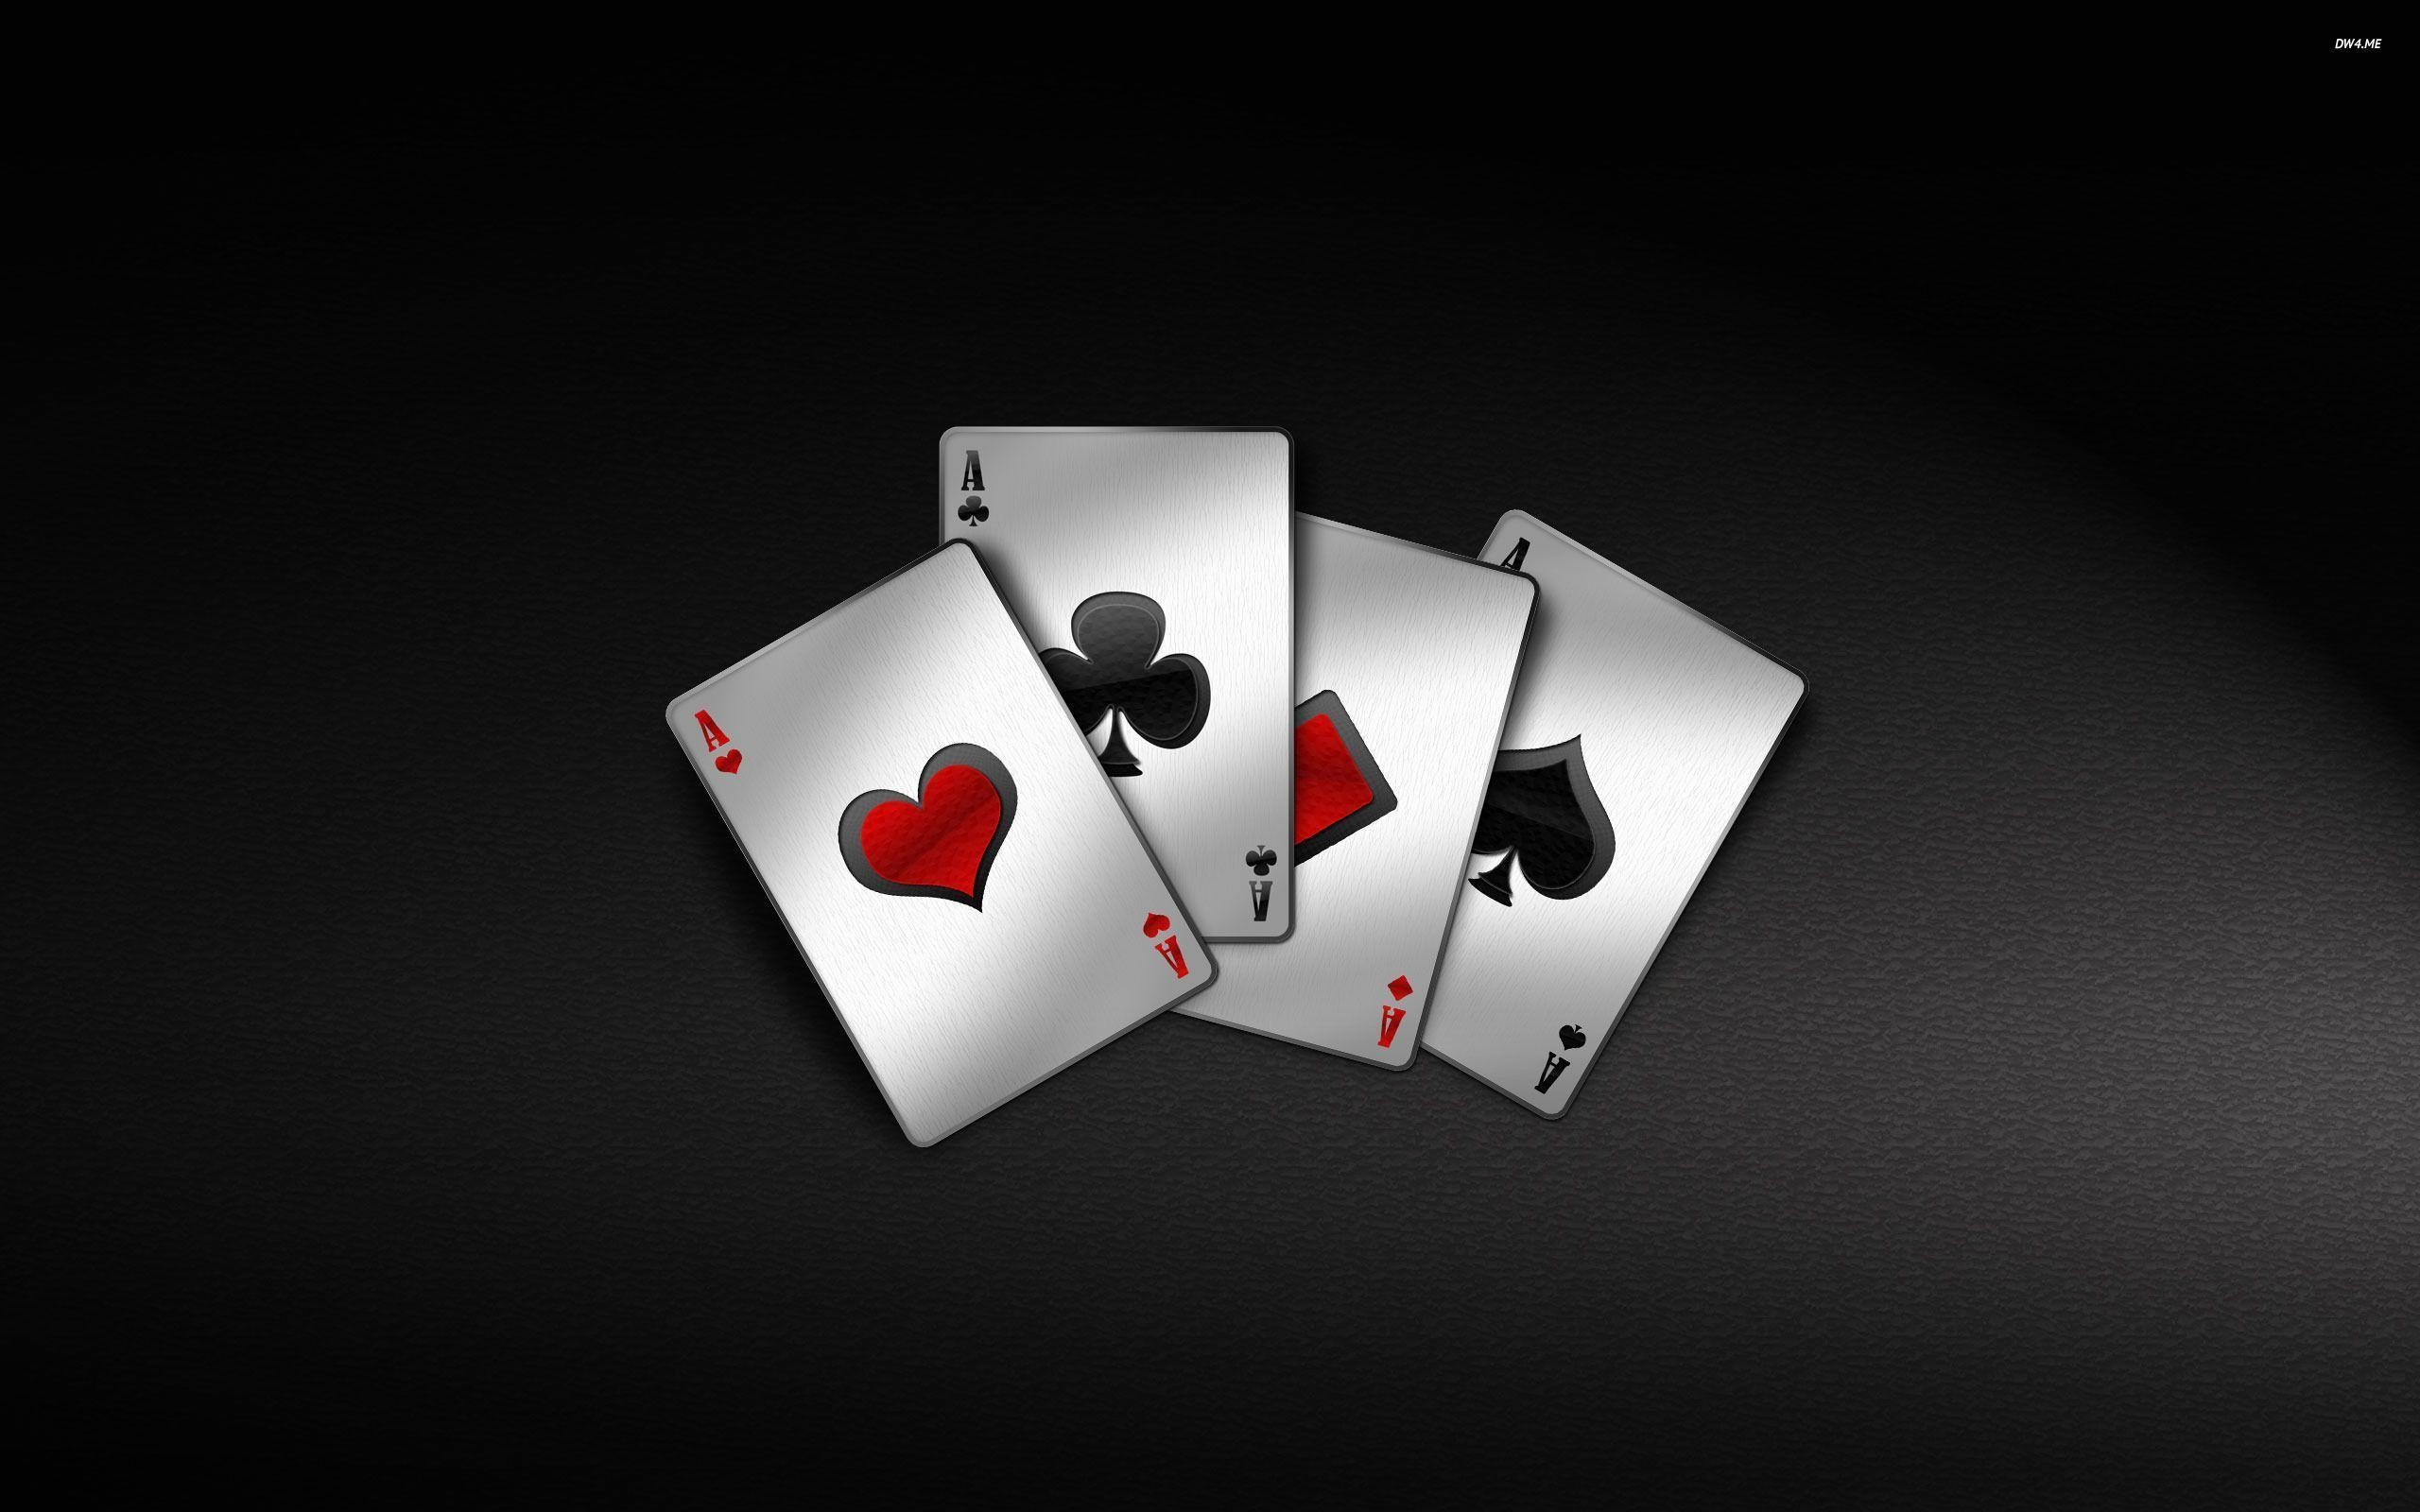 Unclean Truths Regarding Online Gambling Revealed